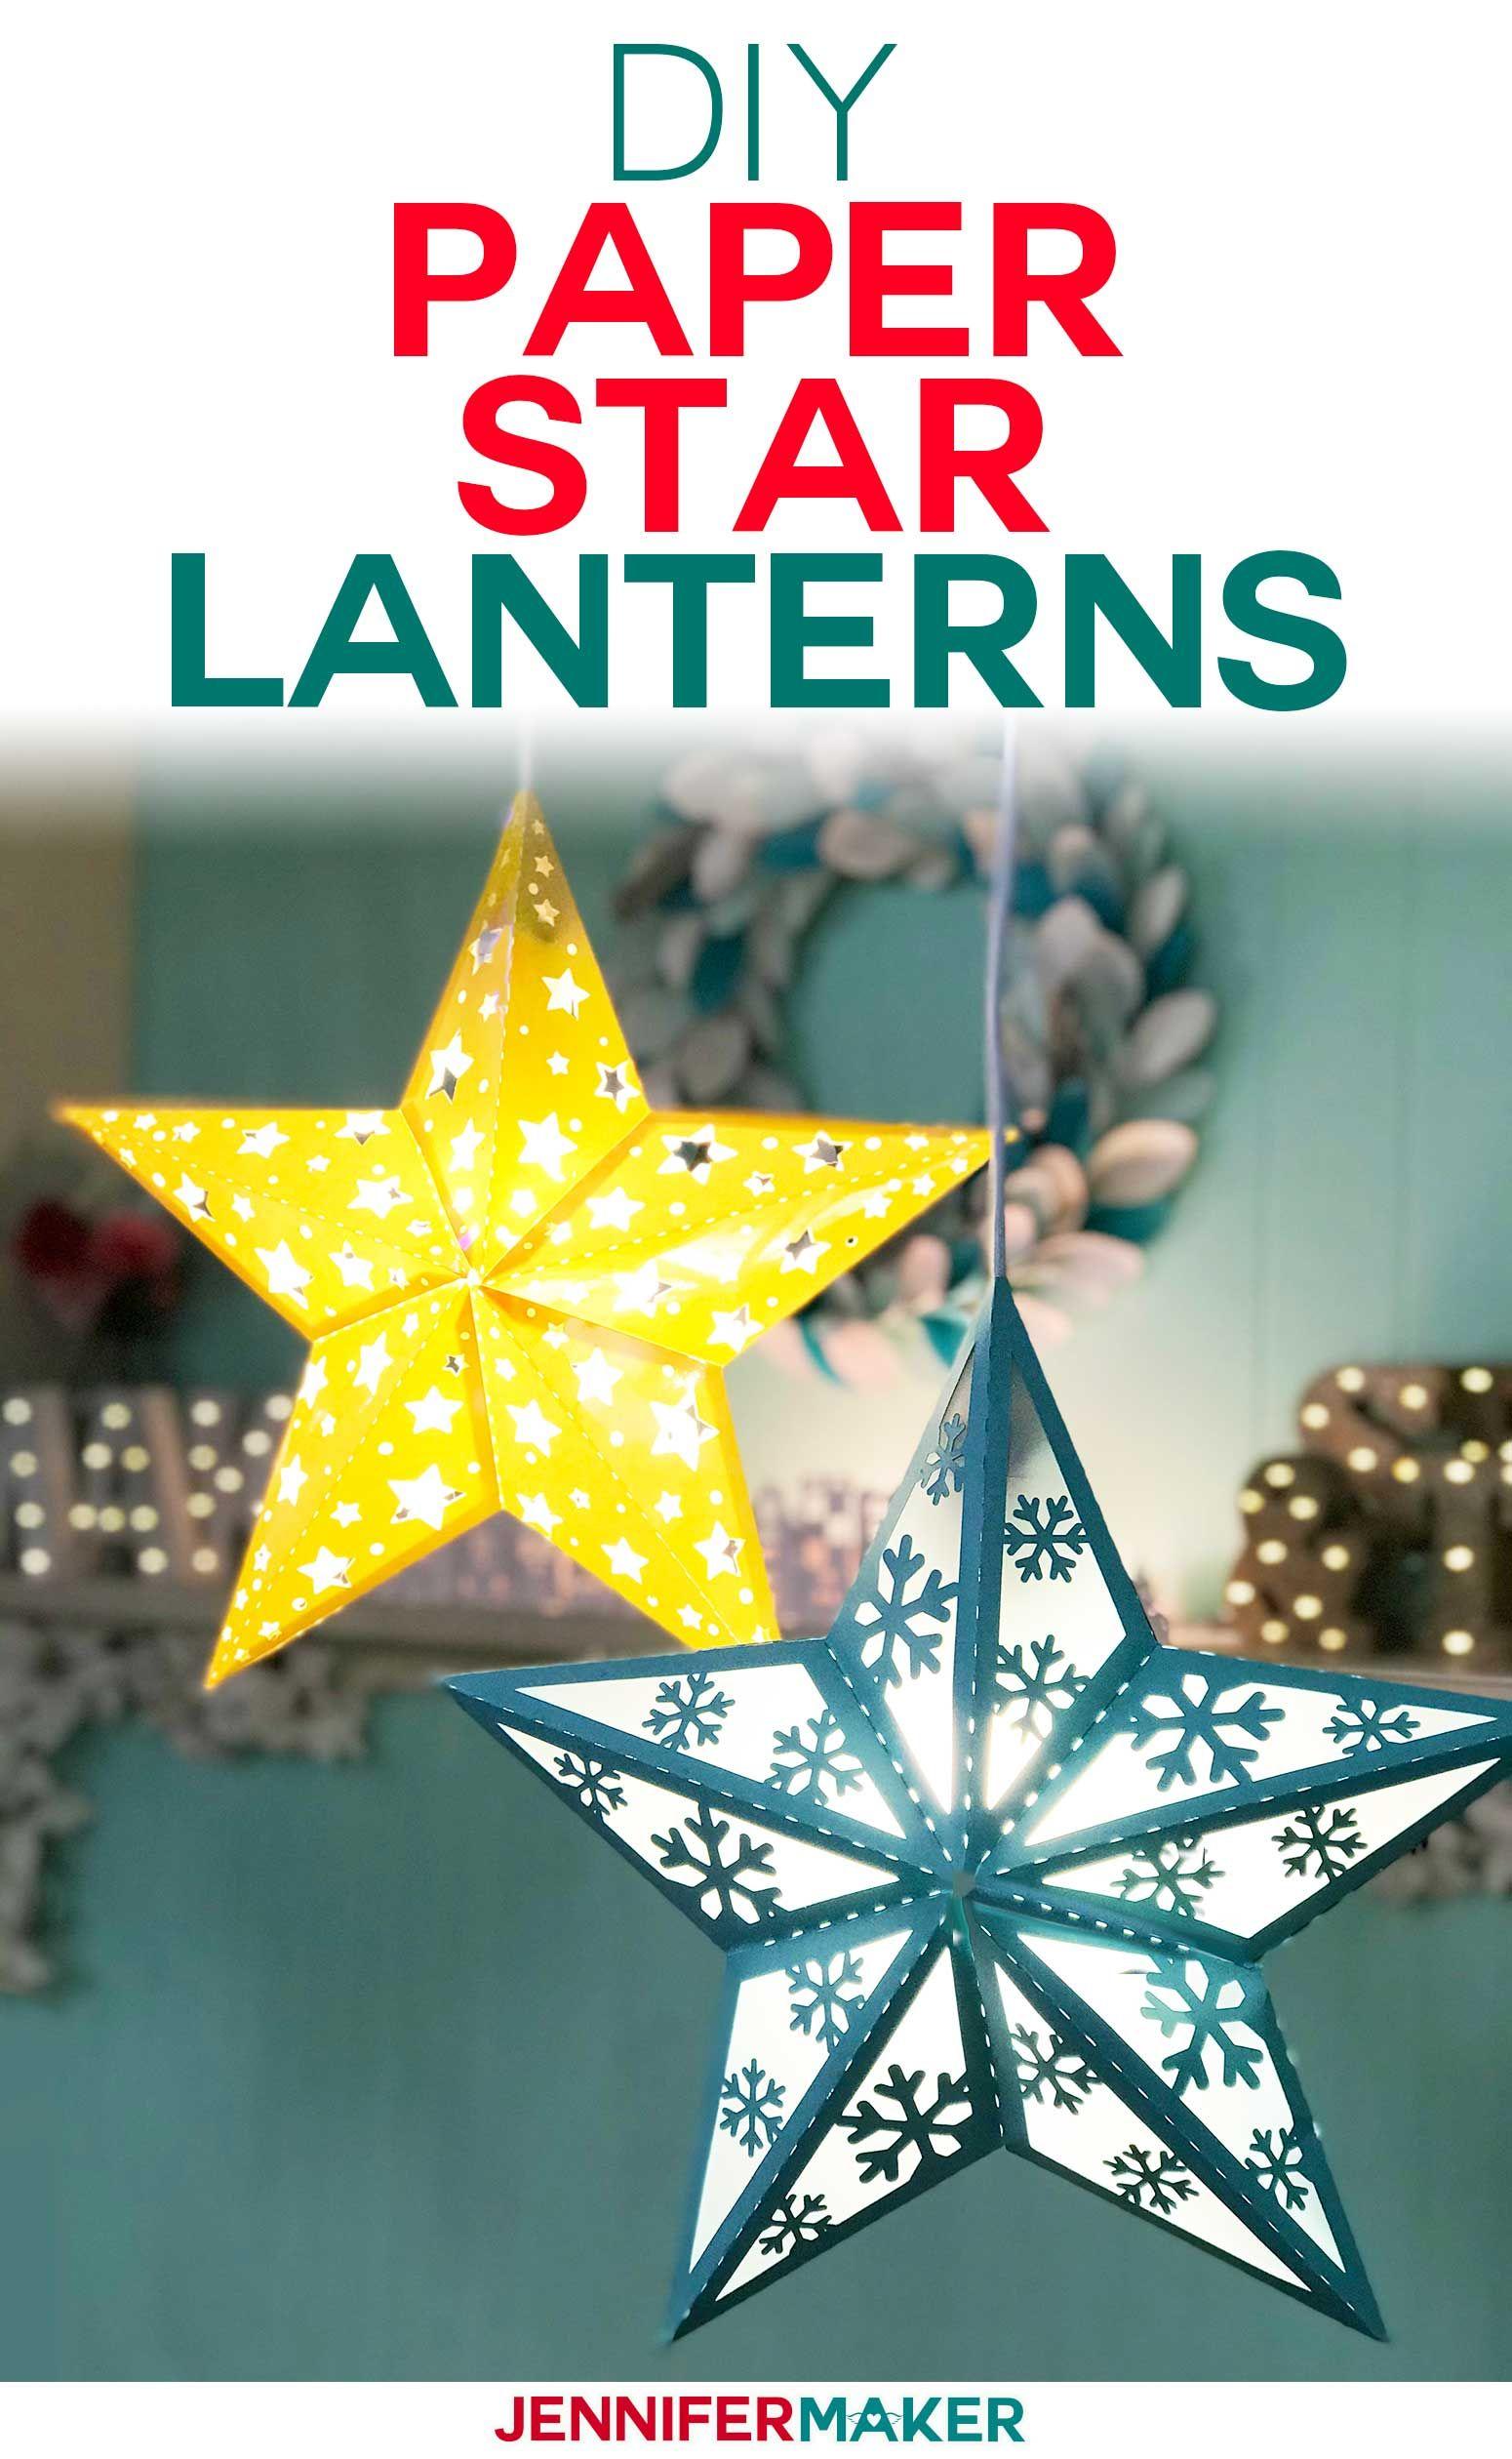 Make Paper Star Lanterns To Brighten Up Your Winter Paper Star